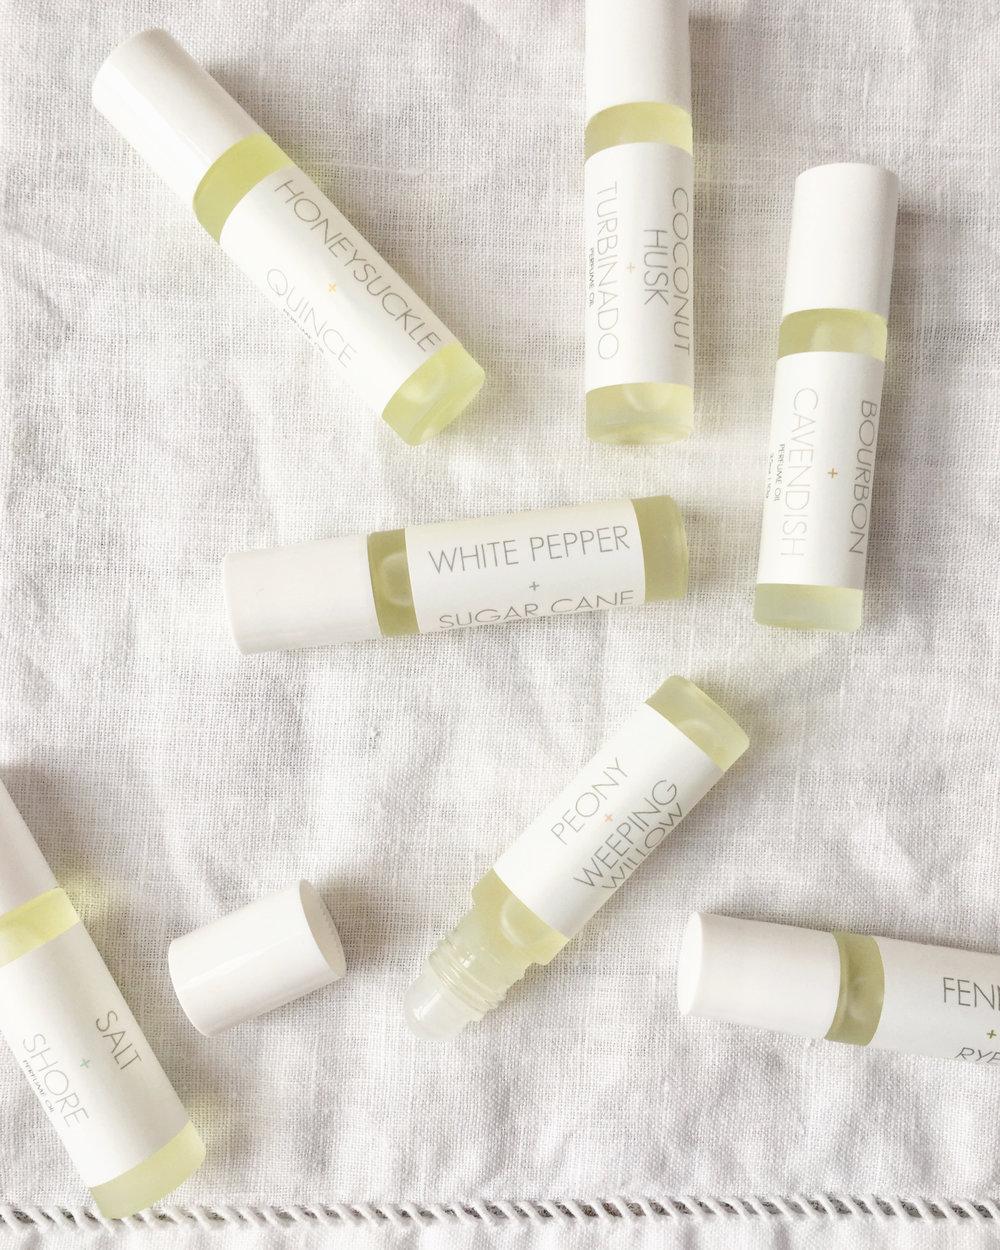 RICA bath + body Roll-on Perfume Assorted on White Napkin 3.jpg